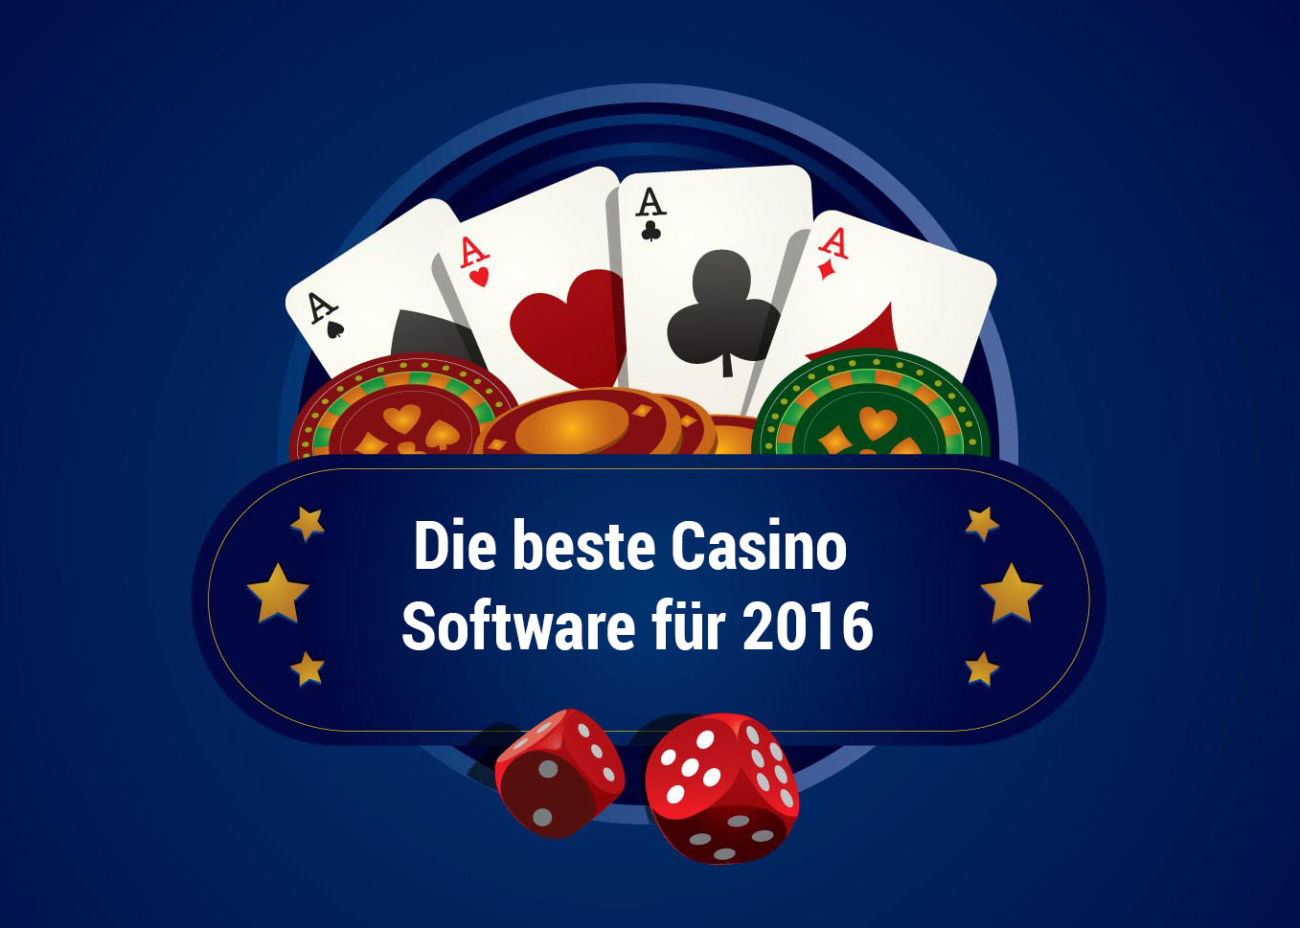 Beste Microgaming Casino LaVida - 19699